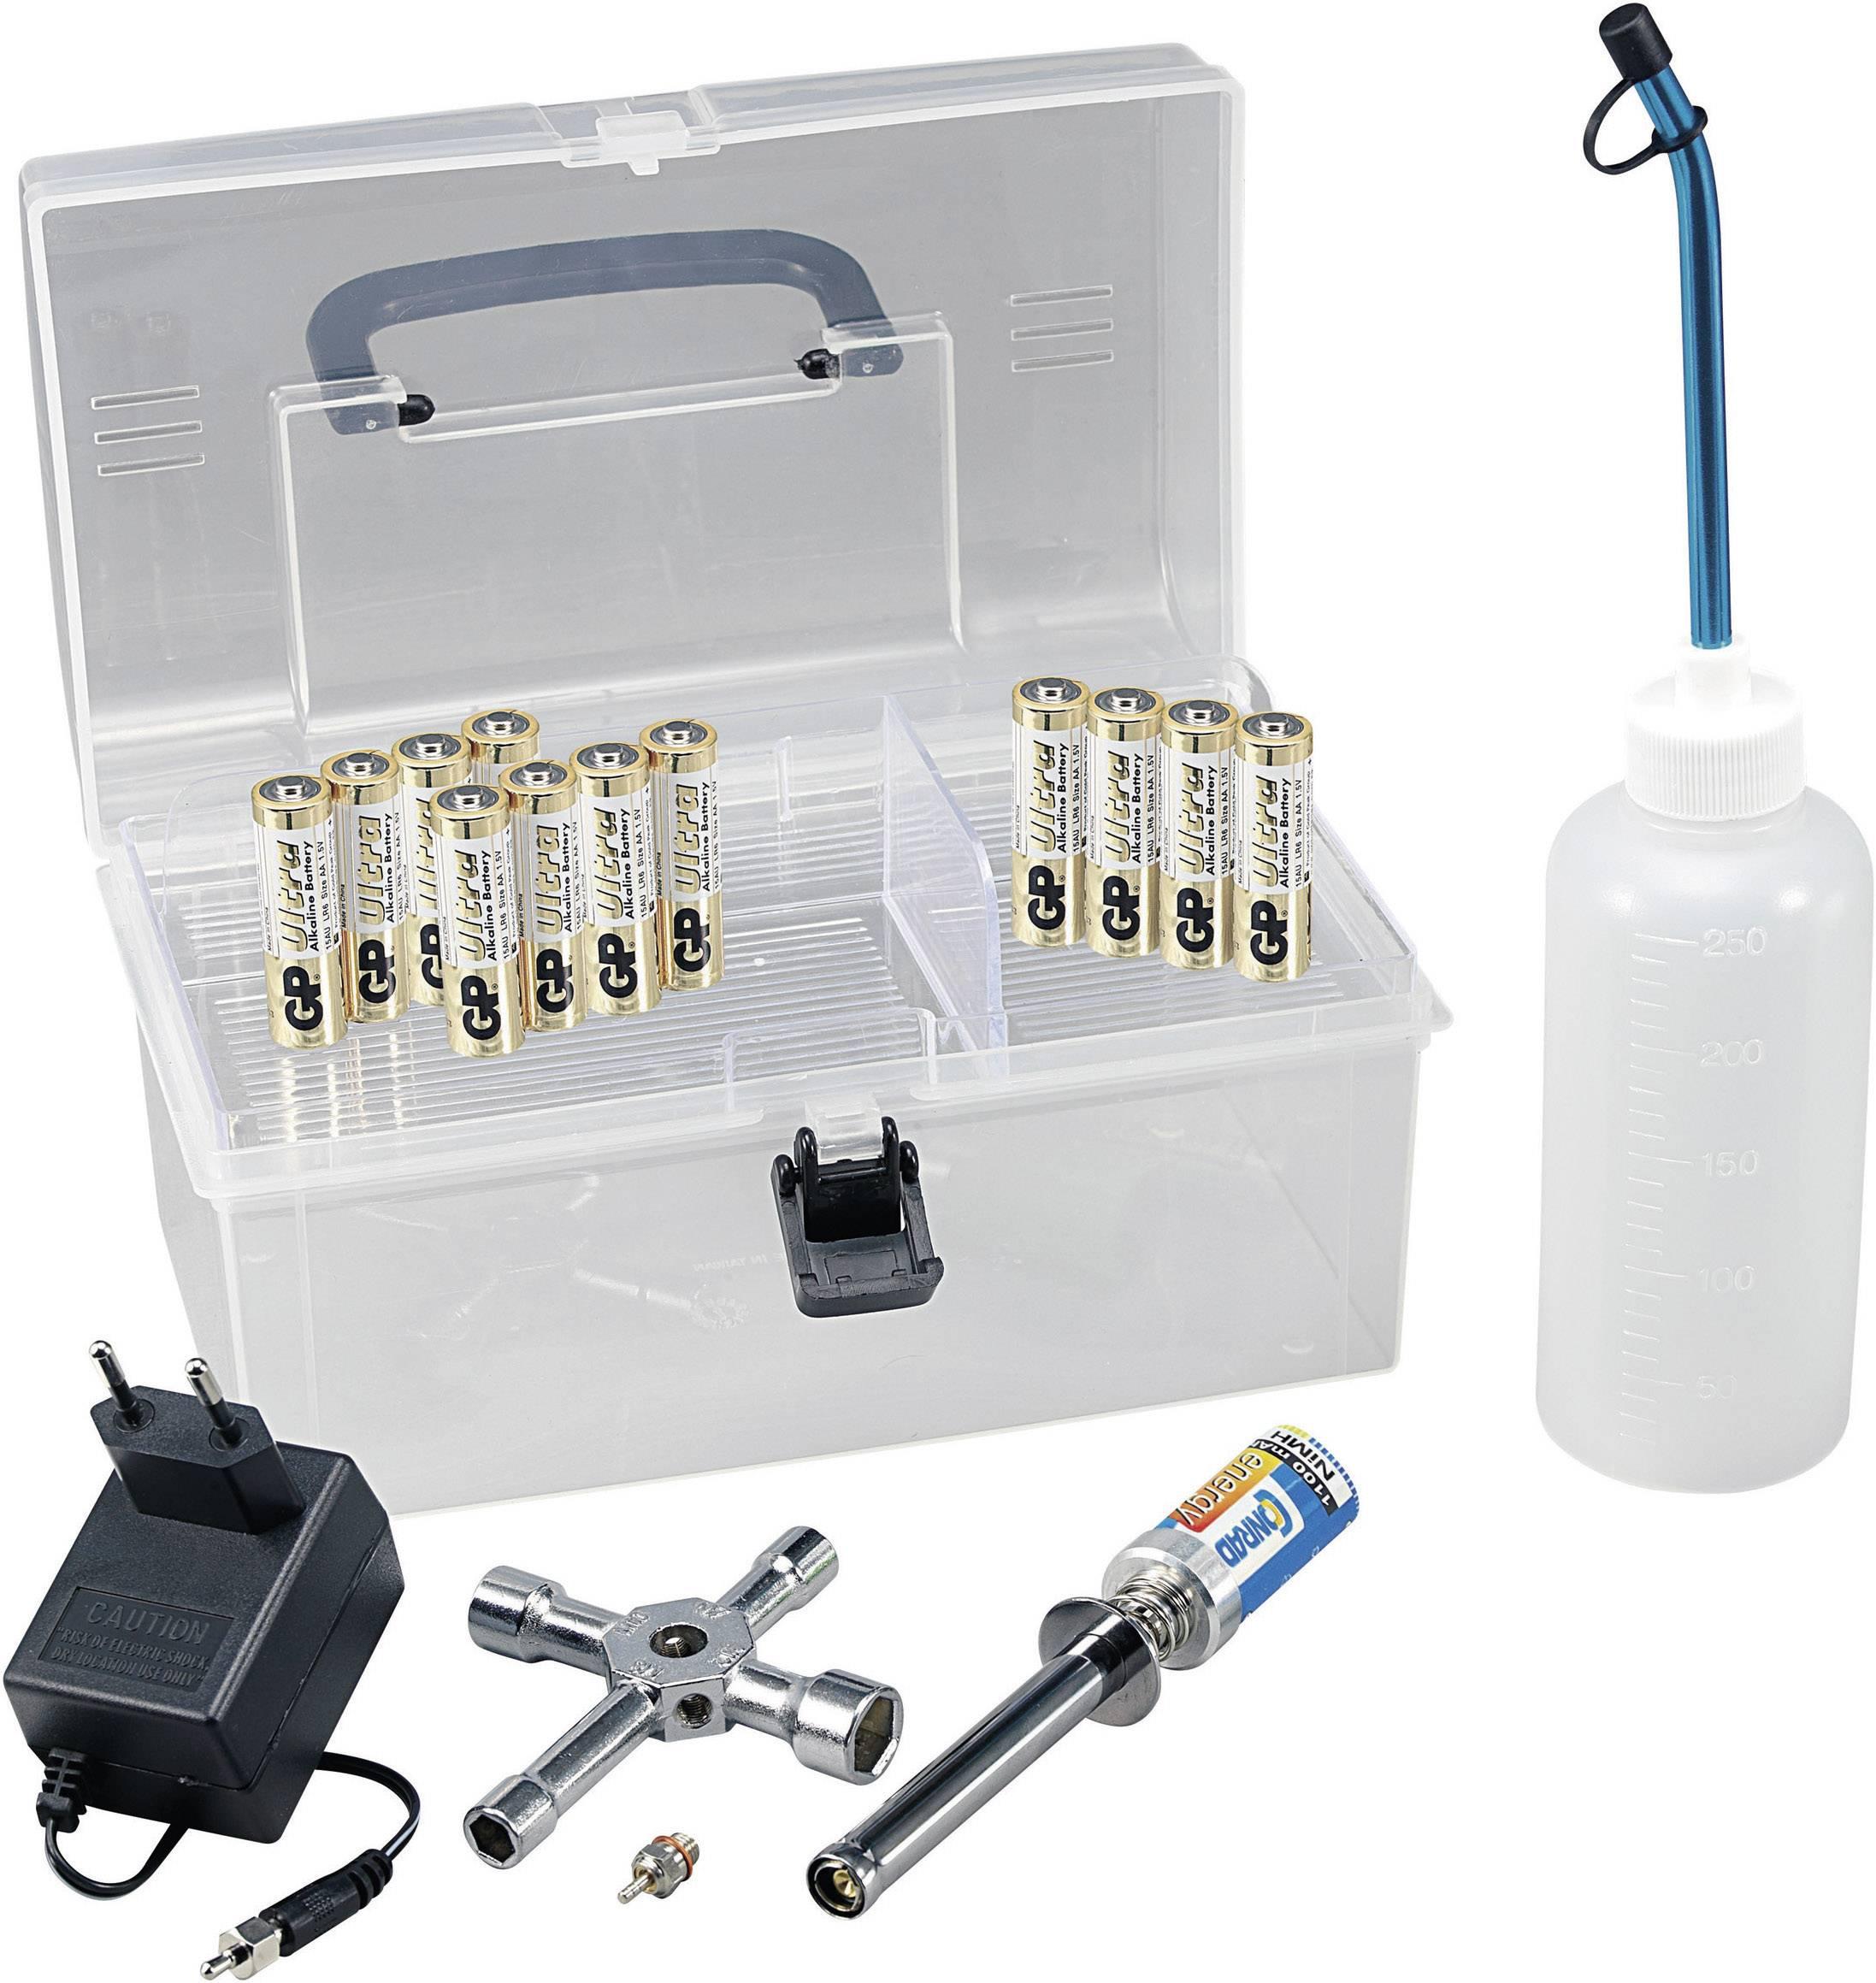 Souprava součástek pro benzínová auta Reely Nitrobox